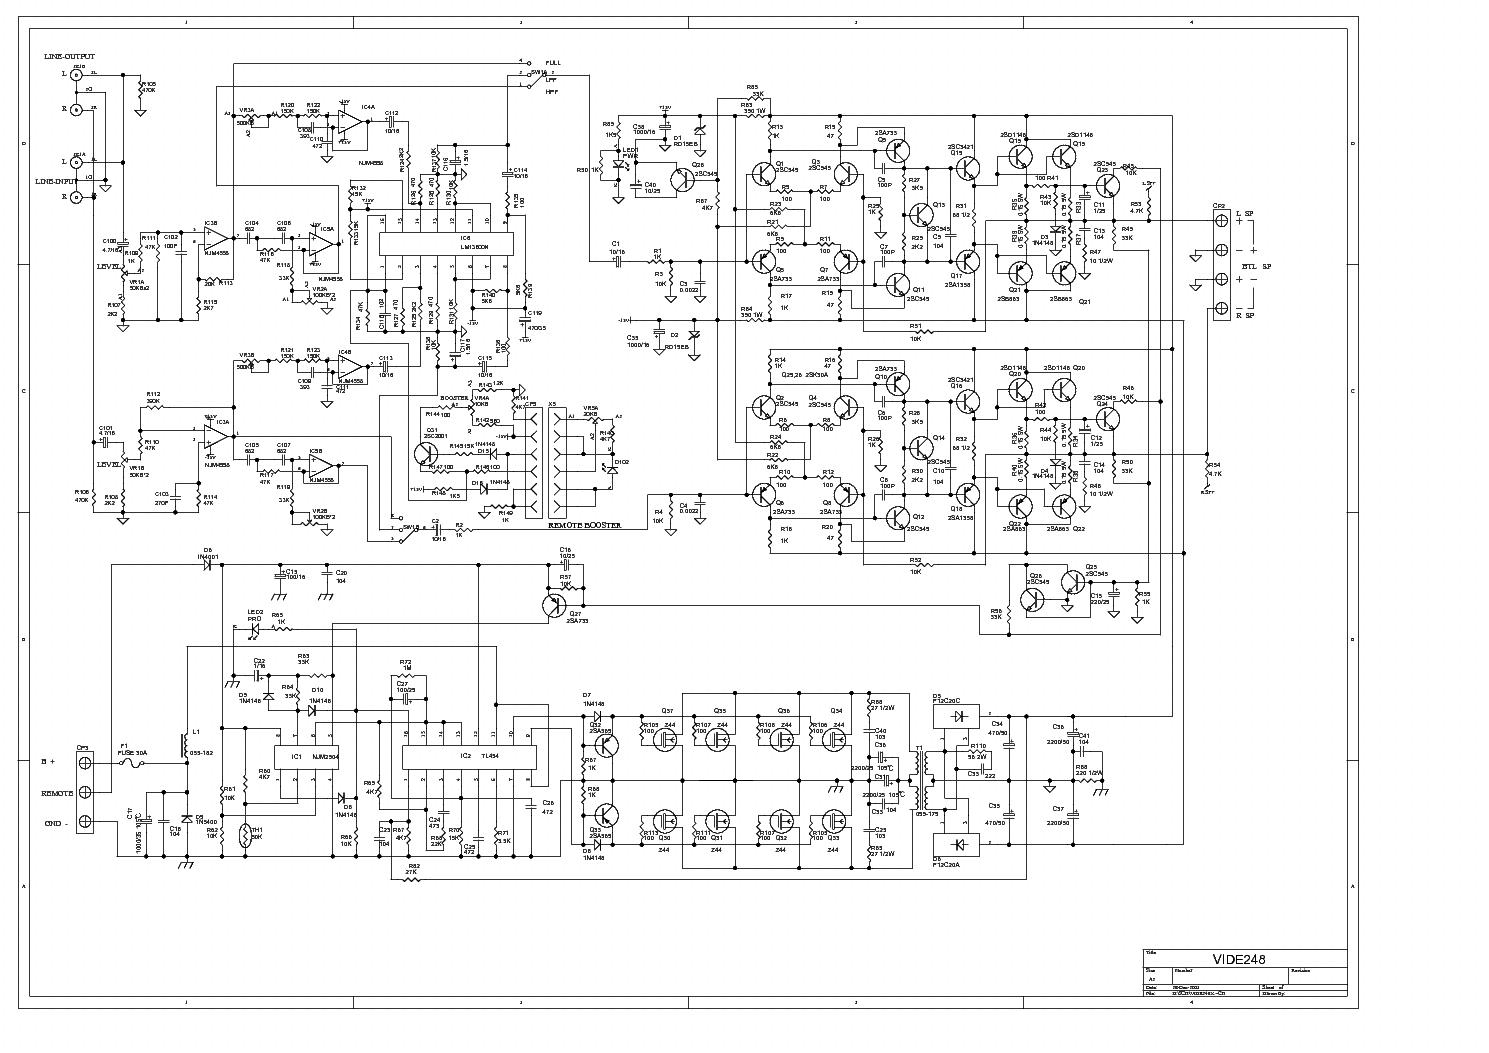 vibe amp wiring diagram wiring diagram virtual fretboard. Black Bedroom Furniture Sets. Home Design Ideas